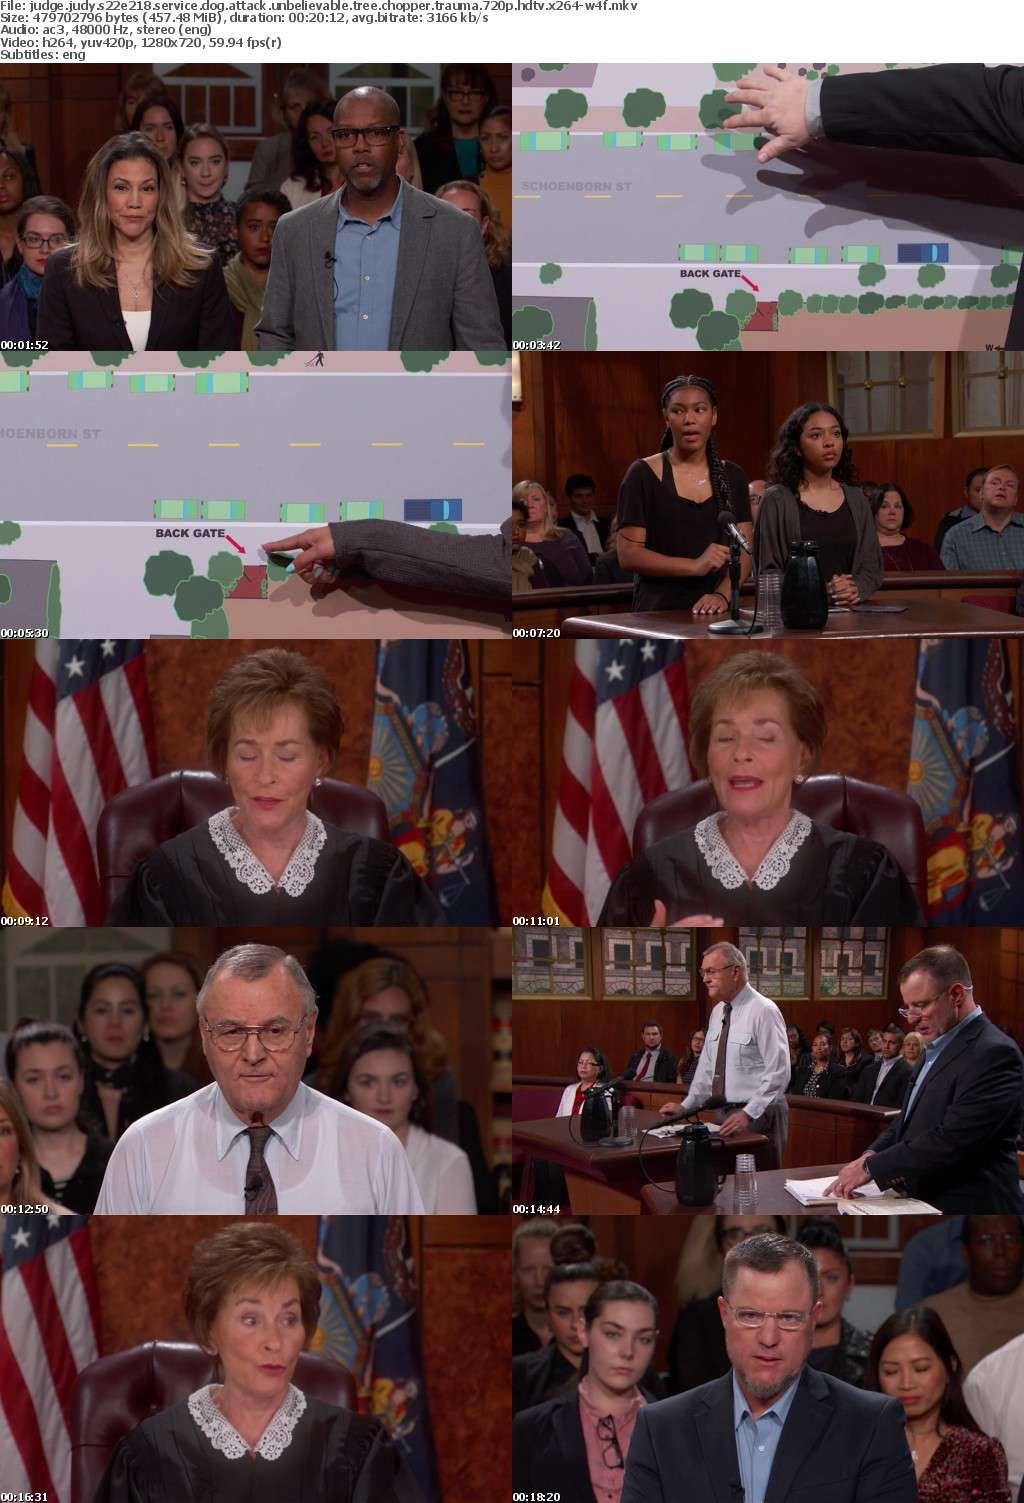 Judge Judy S22E218 Service Dog Attack Unbelievable Tree Chopper Trauma 720p HDTV x264-W4F